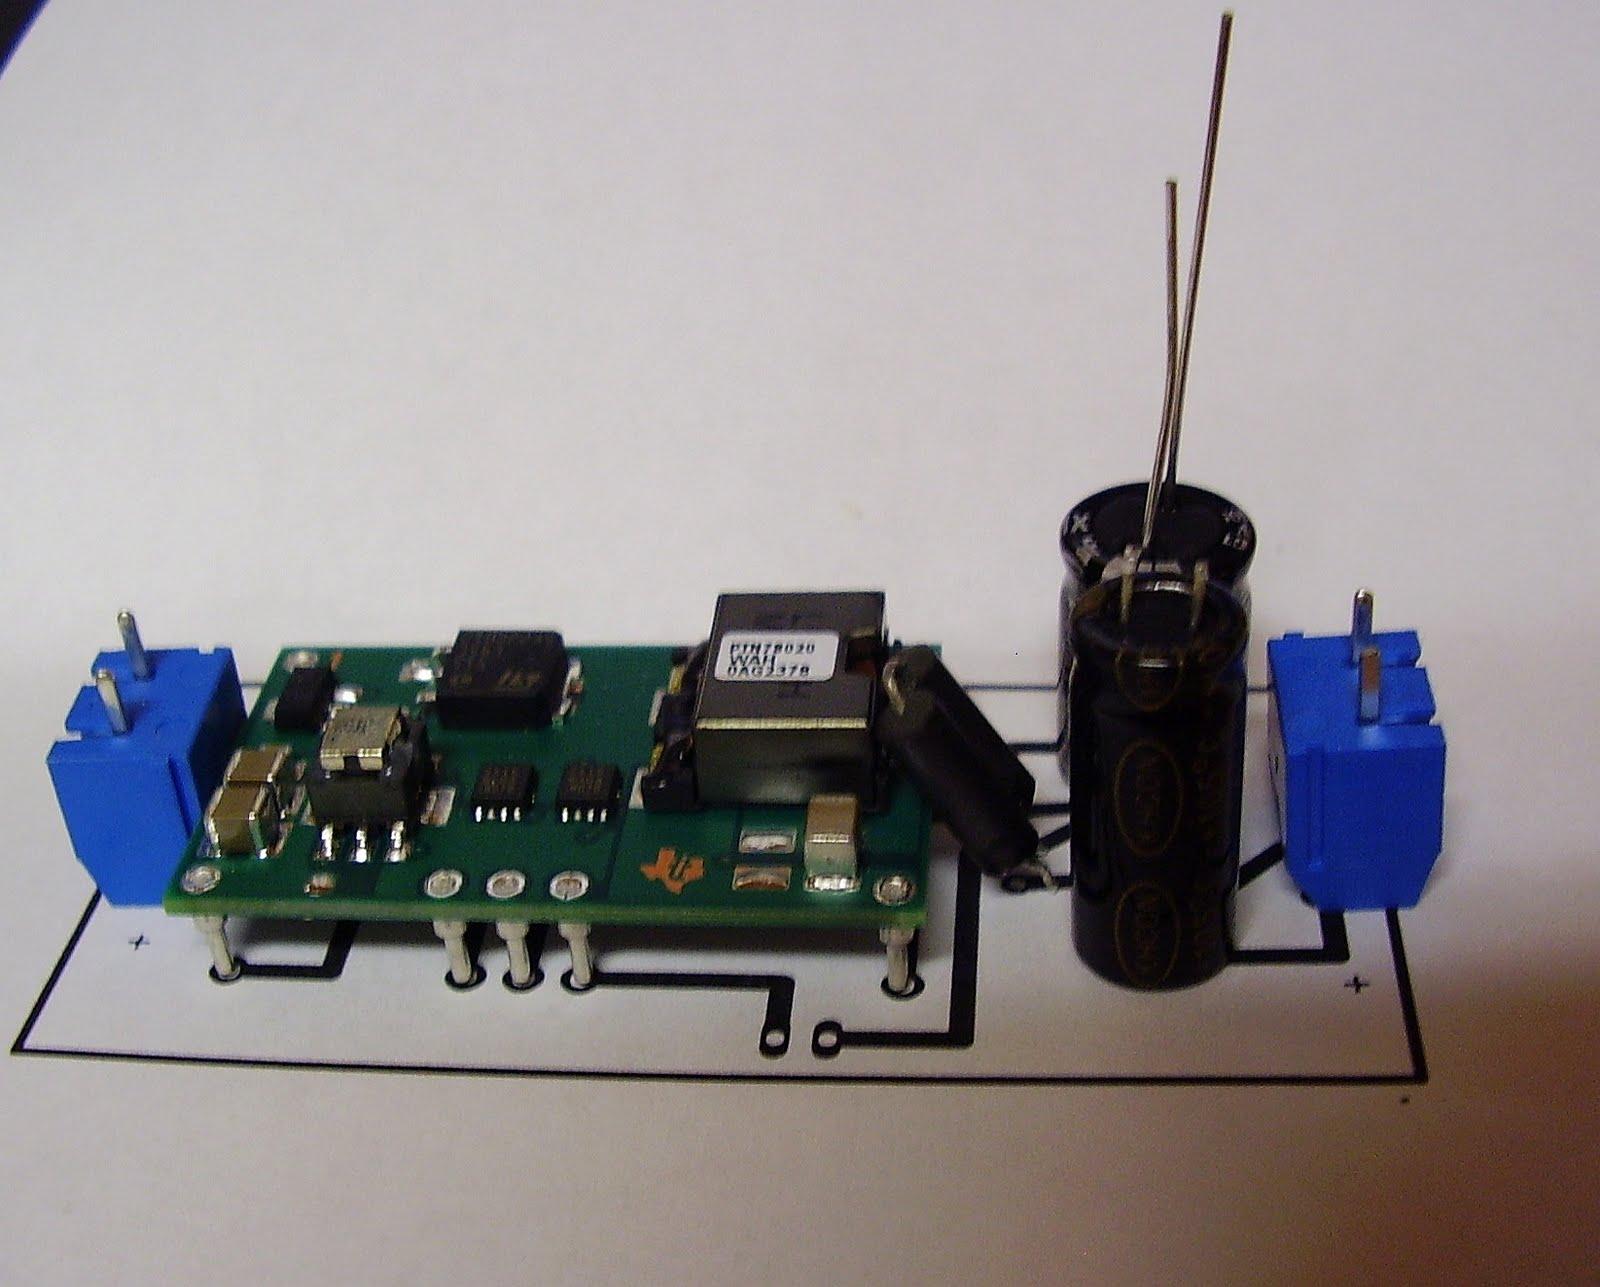 Karosium 2011 Linear Ltc4151 Voltage And Current Monitoring Device Datasheet